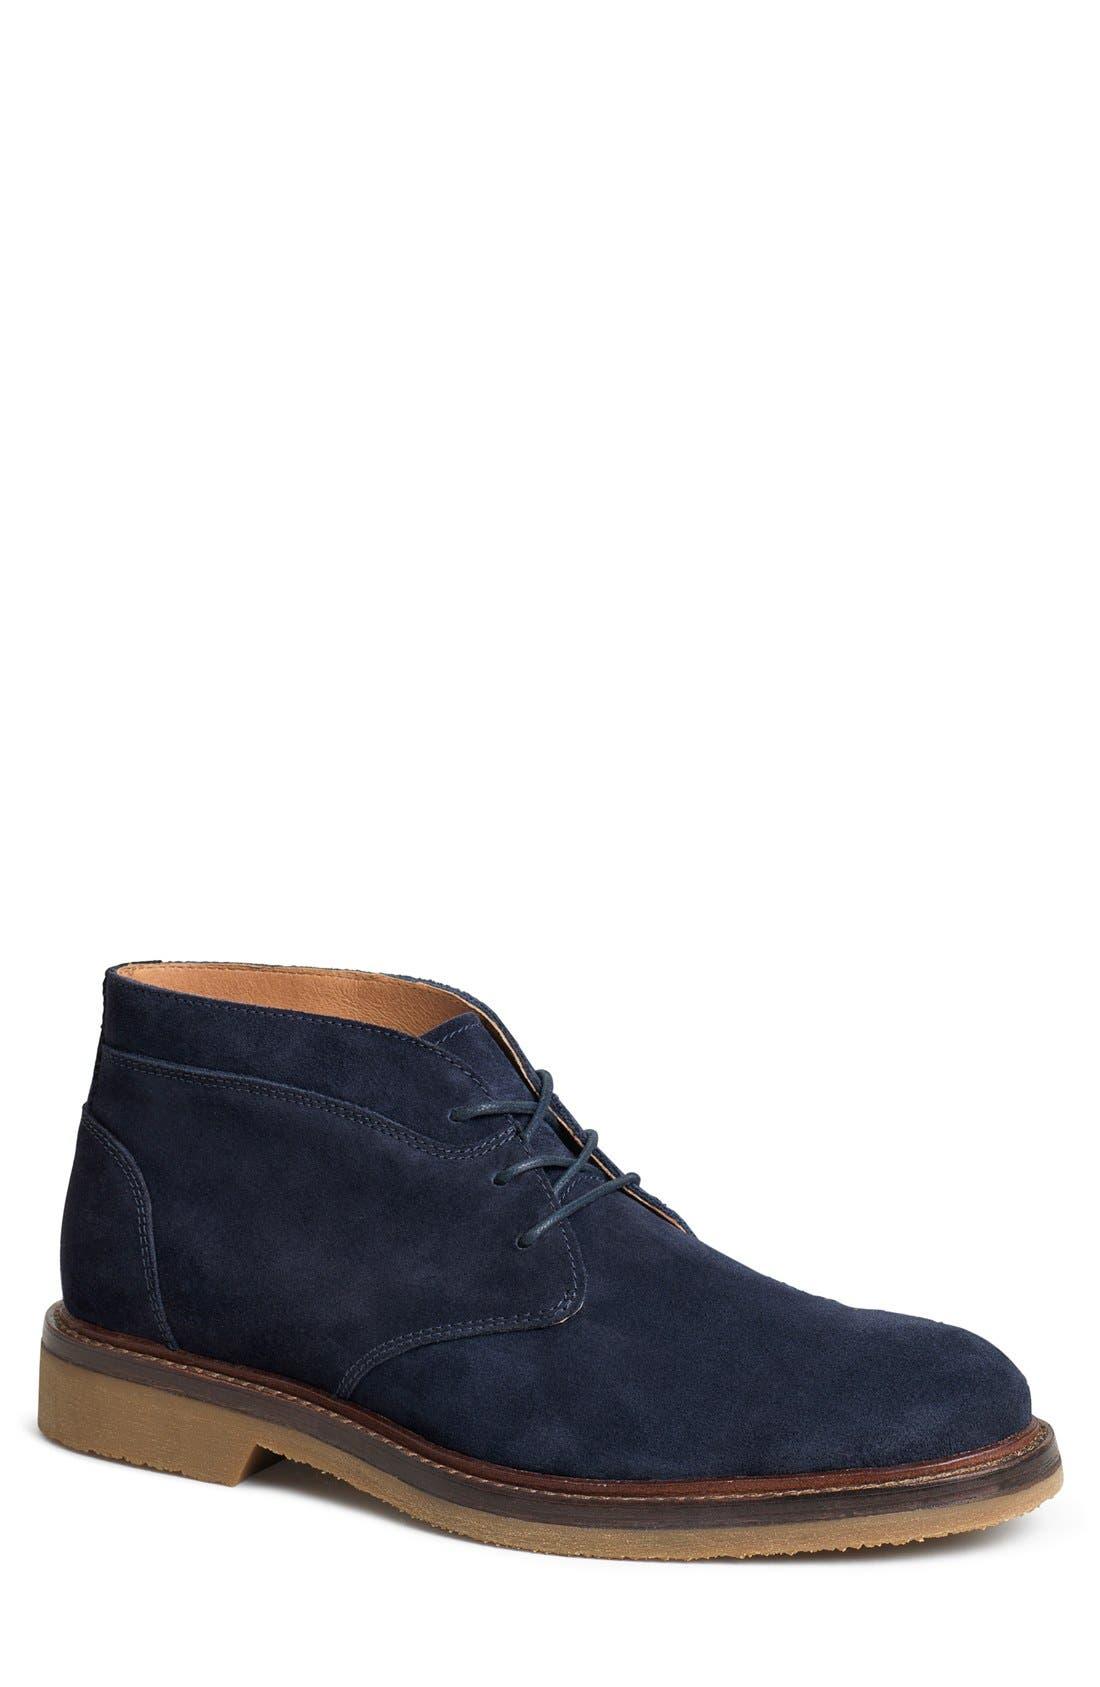 Trask 'Colton' Chukka Boot (Men)